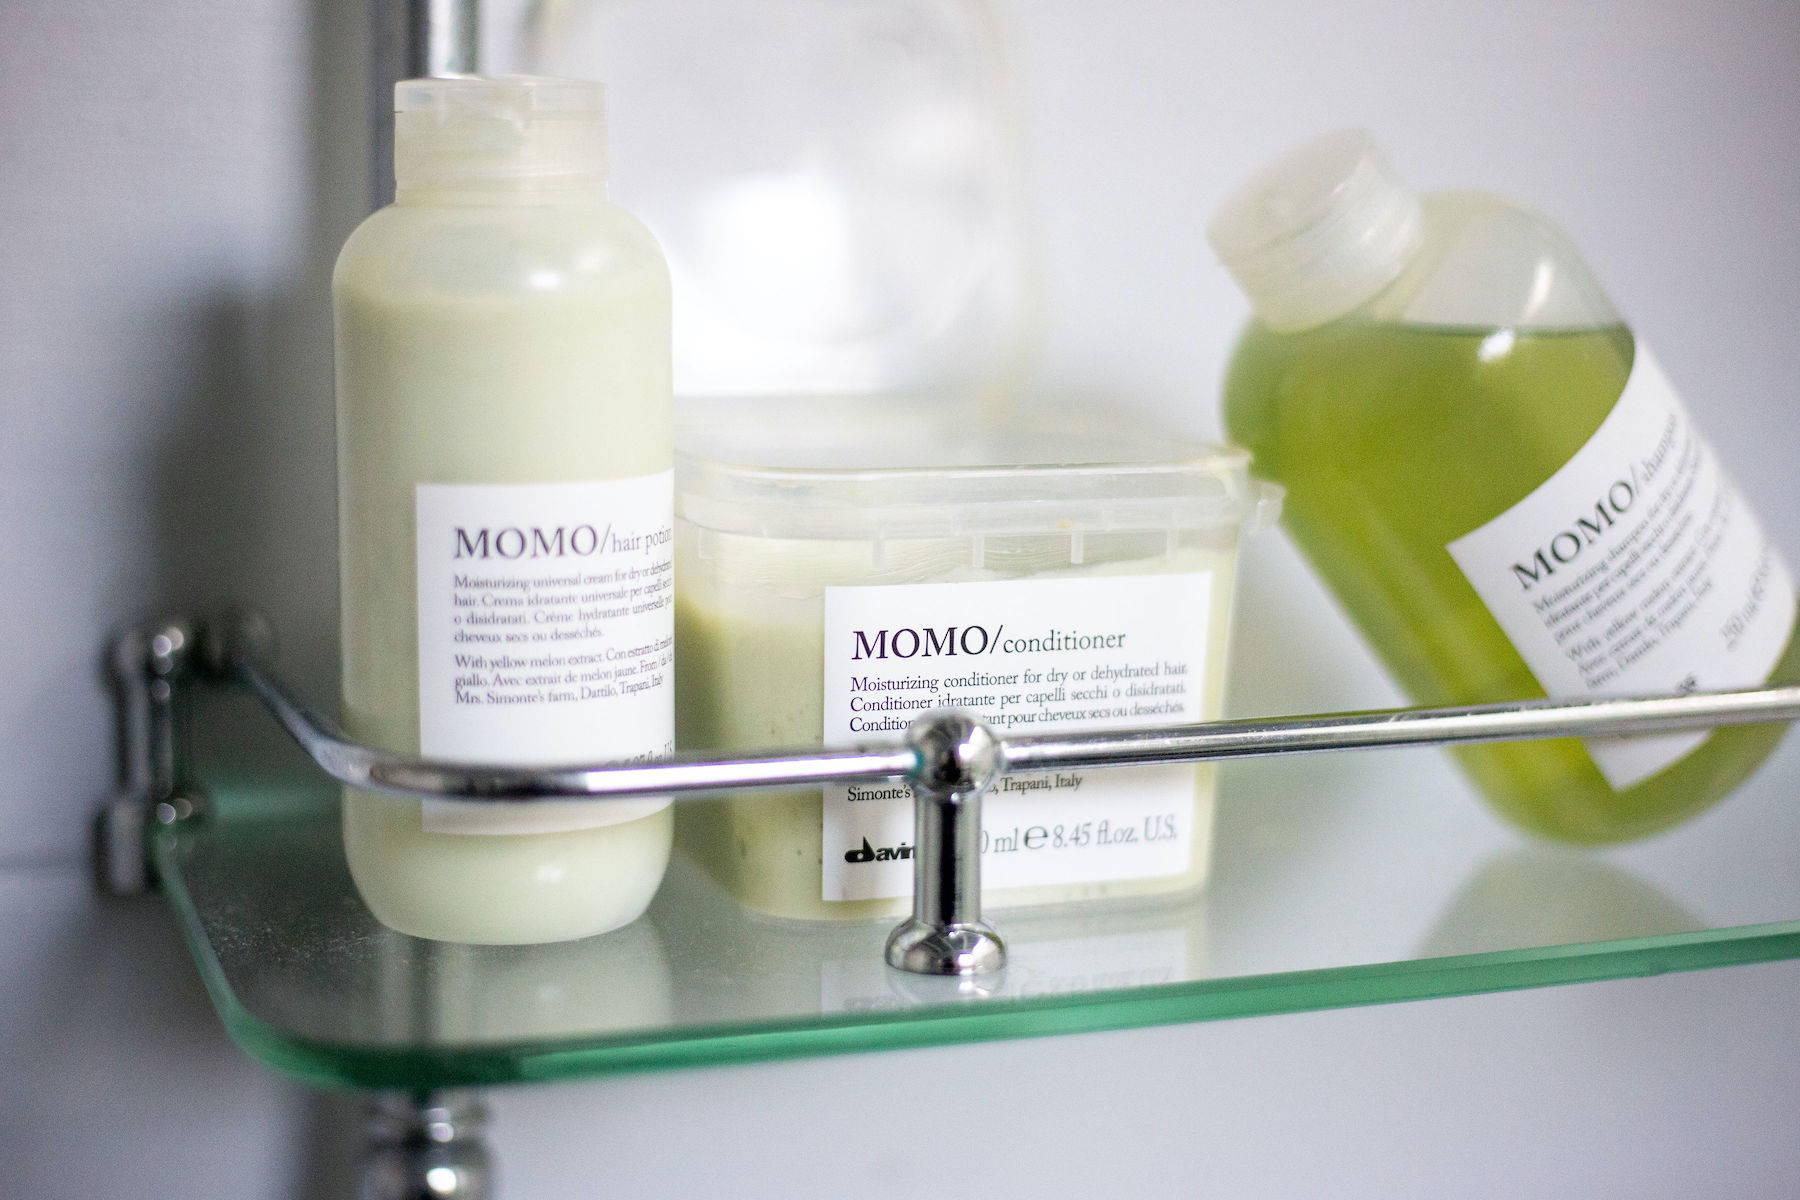 Davines MOMO moisturizing hair products